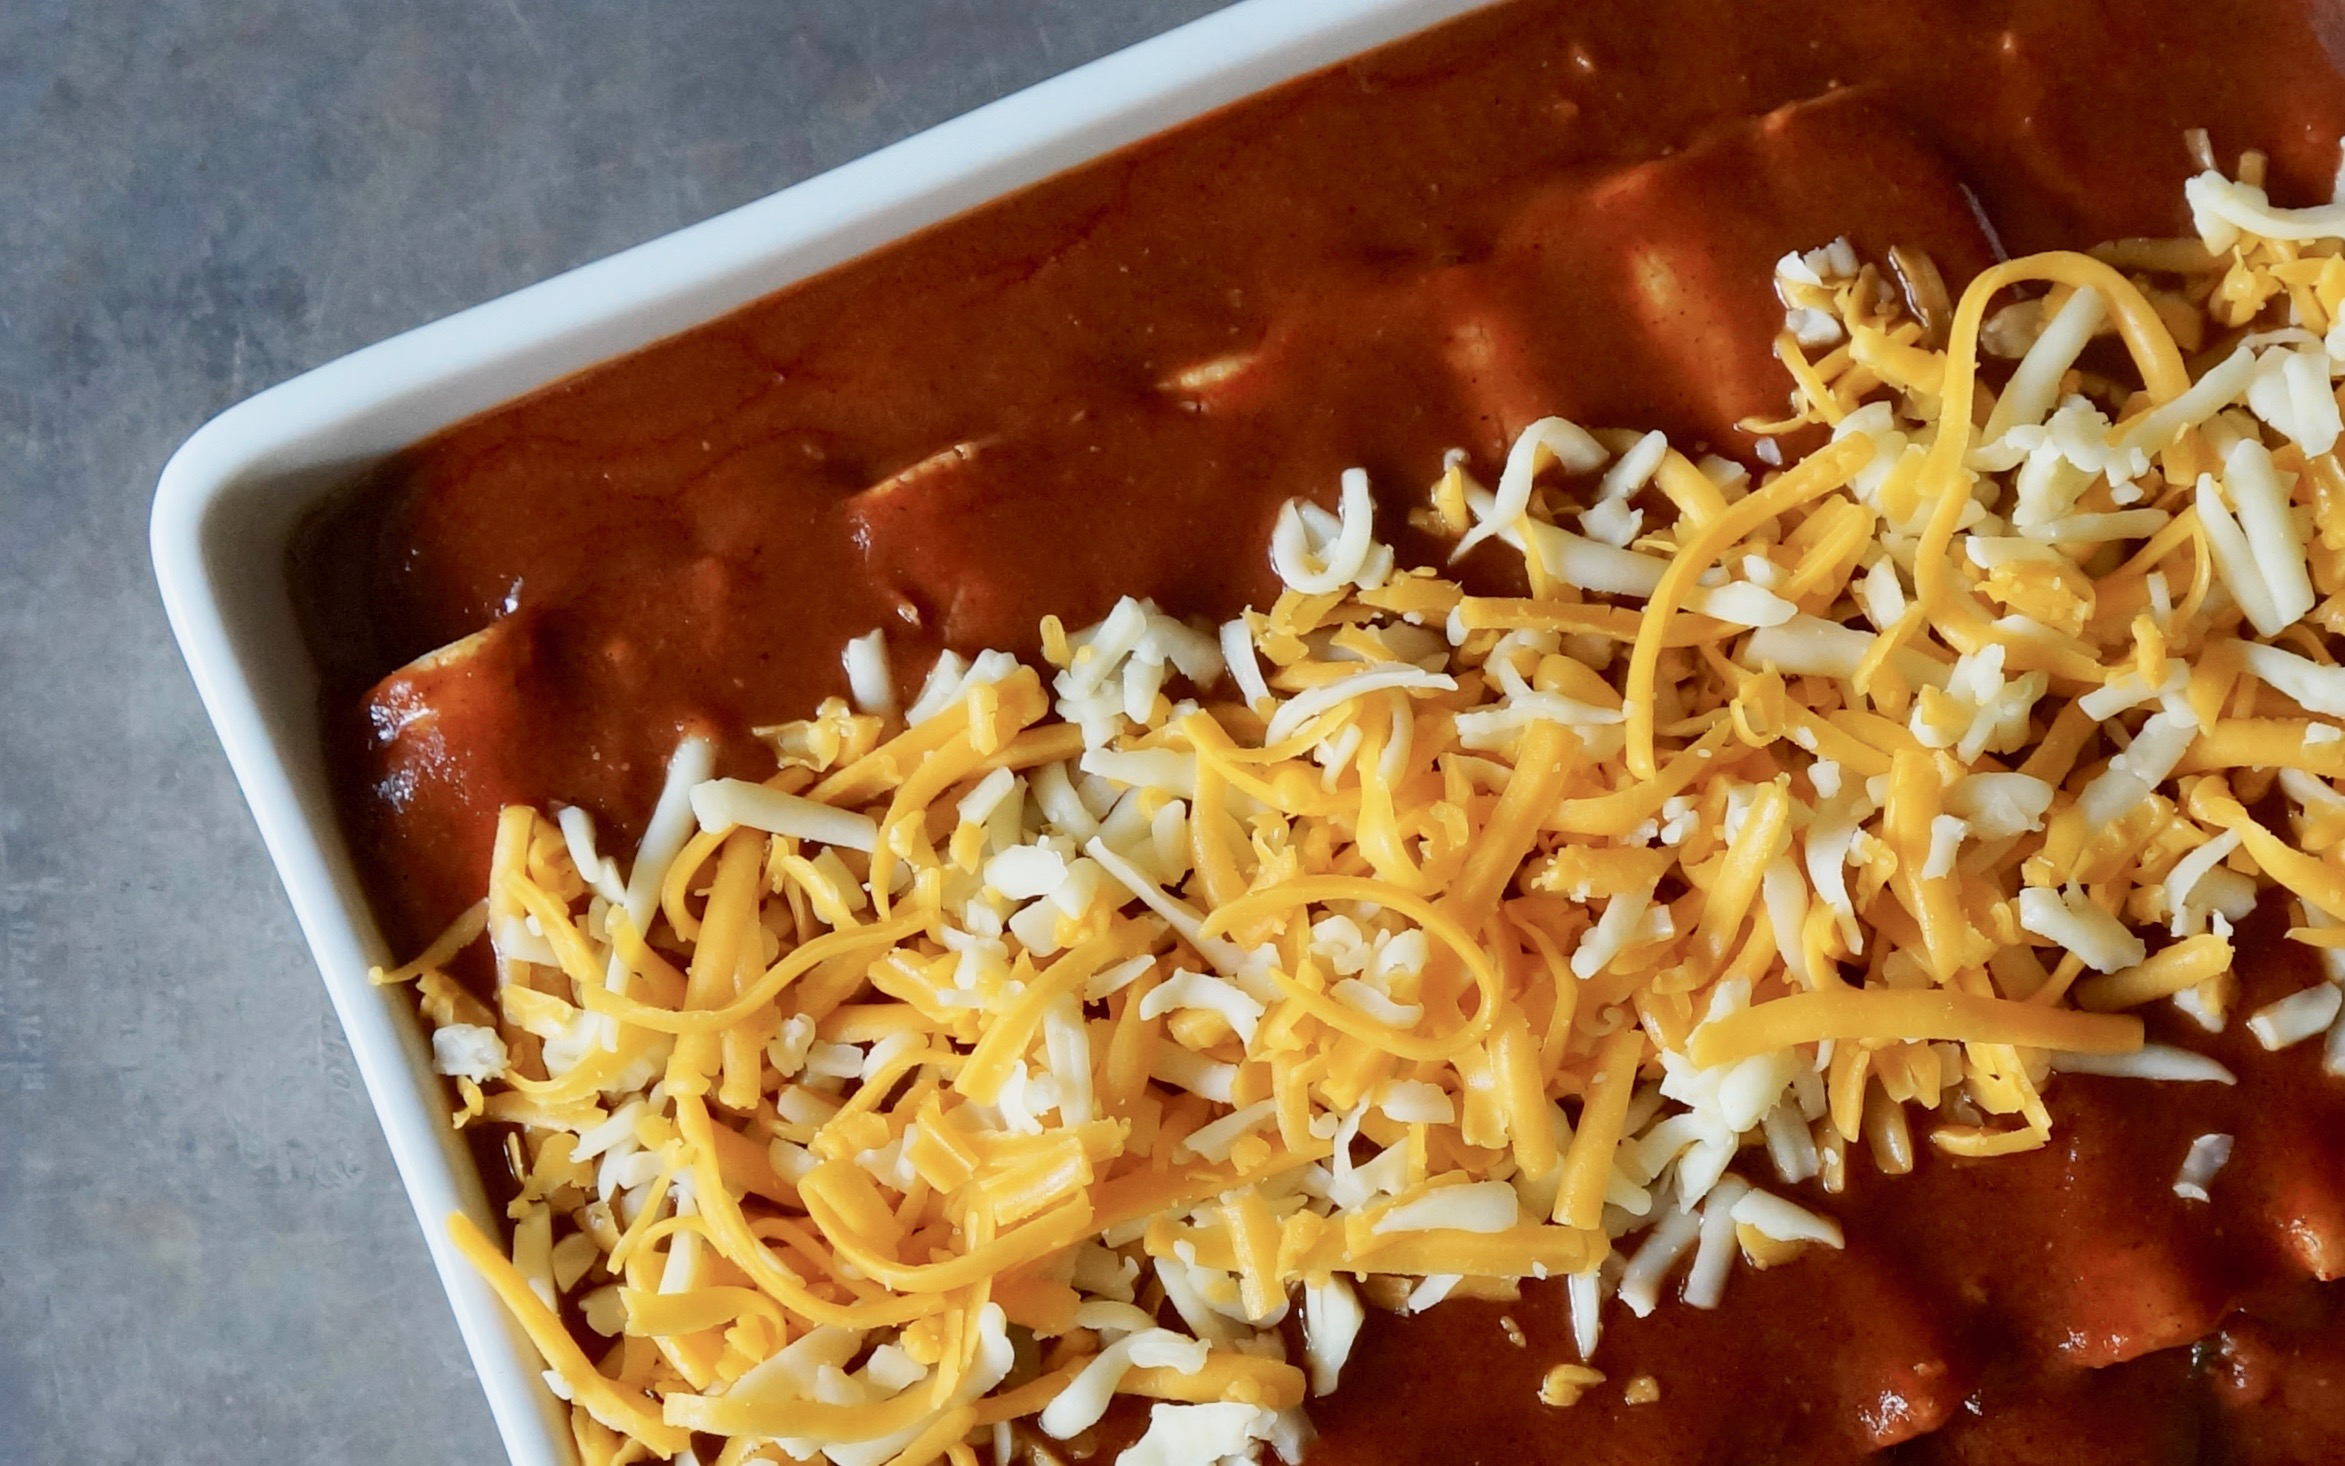 Authentic-Beef-Enchiladas-Mexican-Recipe-Classics-Rebecca-Gordon-Publisher-Buttermilk-Lipstick-Culinary-Entertaining-Tutorials-Cooking-Class-Pastry-Chef-Gardener-Southern-Hostess-Birmingham-Alabama-RebeccaGordon